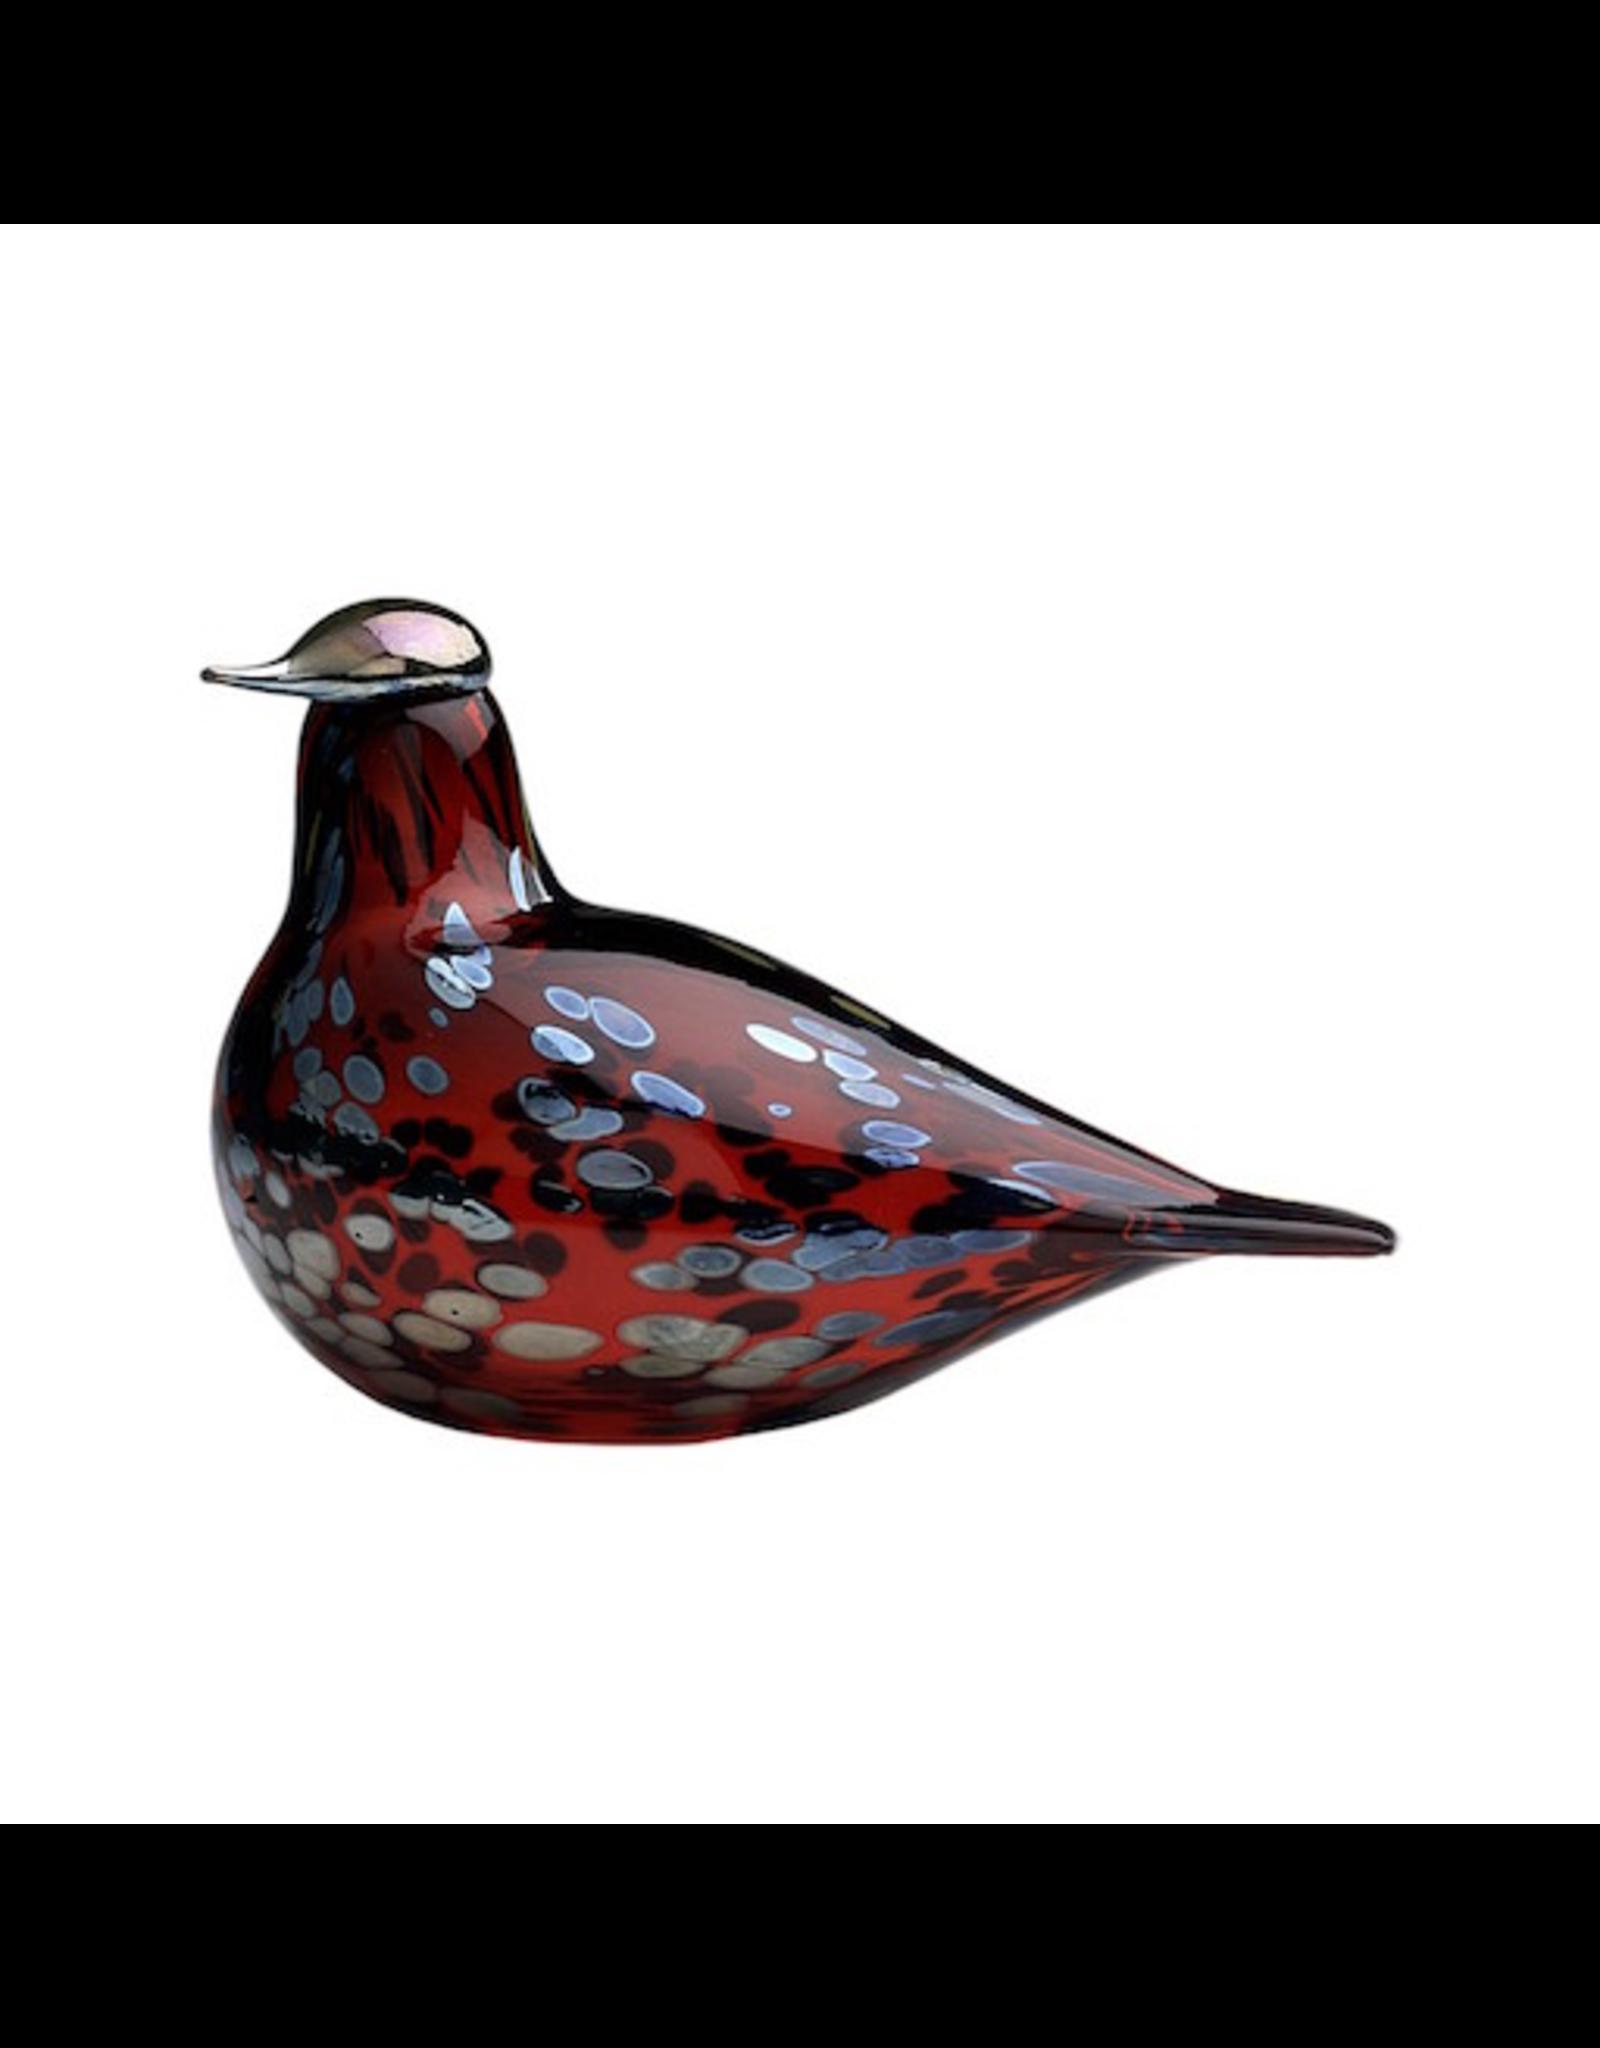 RUBY BIRD CRANBERRY 蔓莓色红宝石鸟